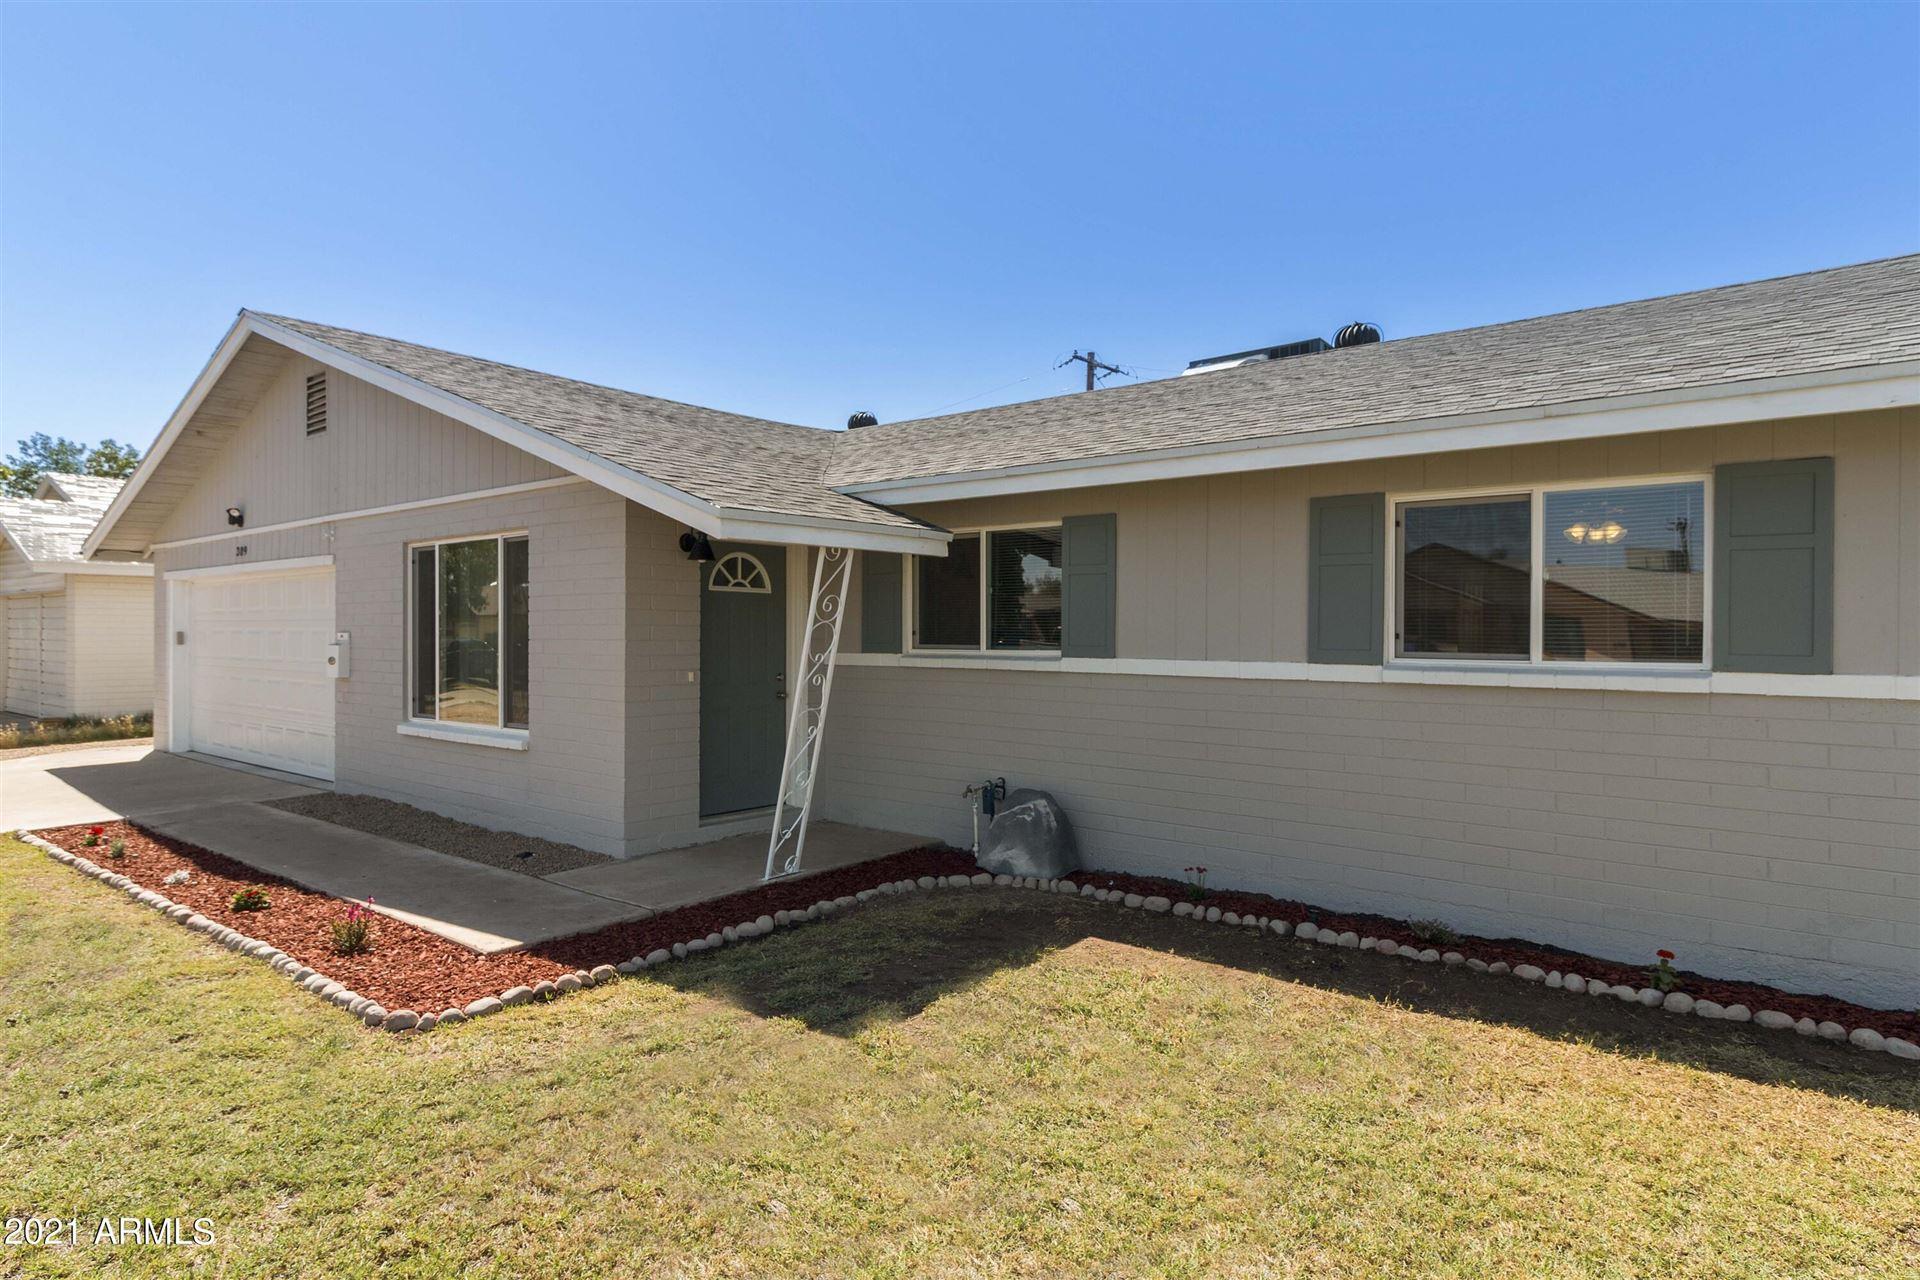 309 E LAGUNA Drive, Tempe, AZ 85282 - MLS#: 6231300